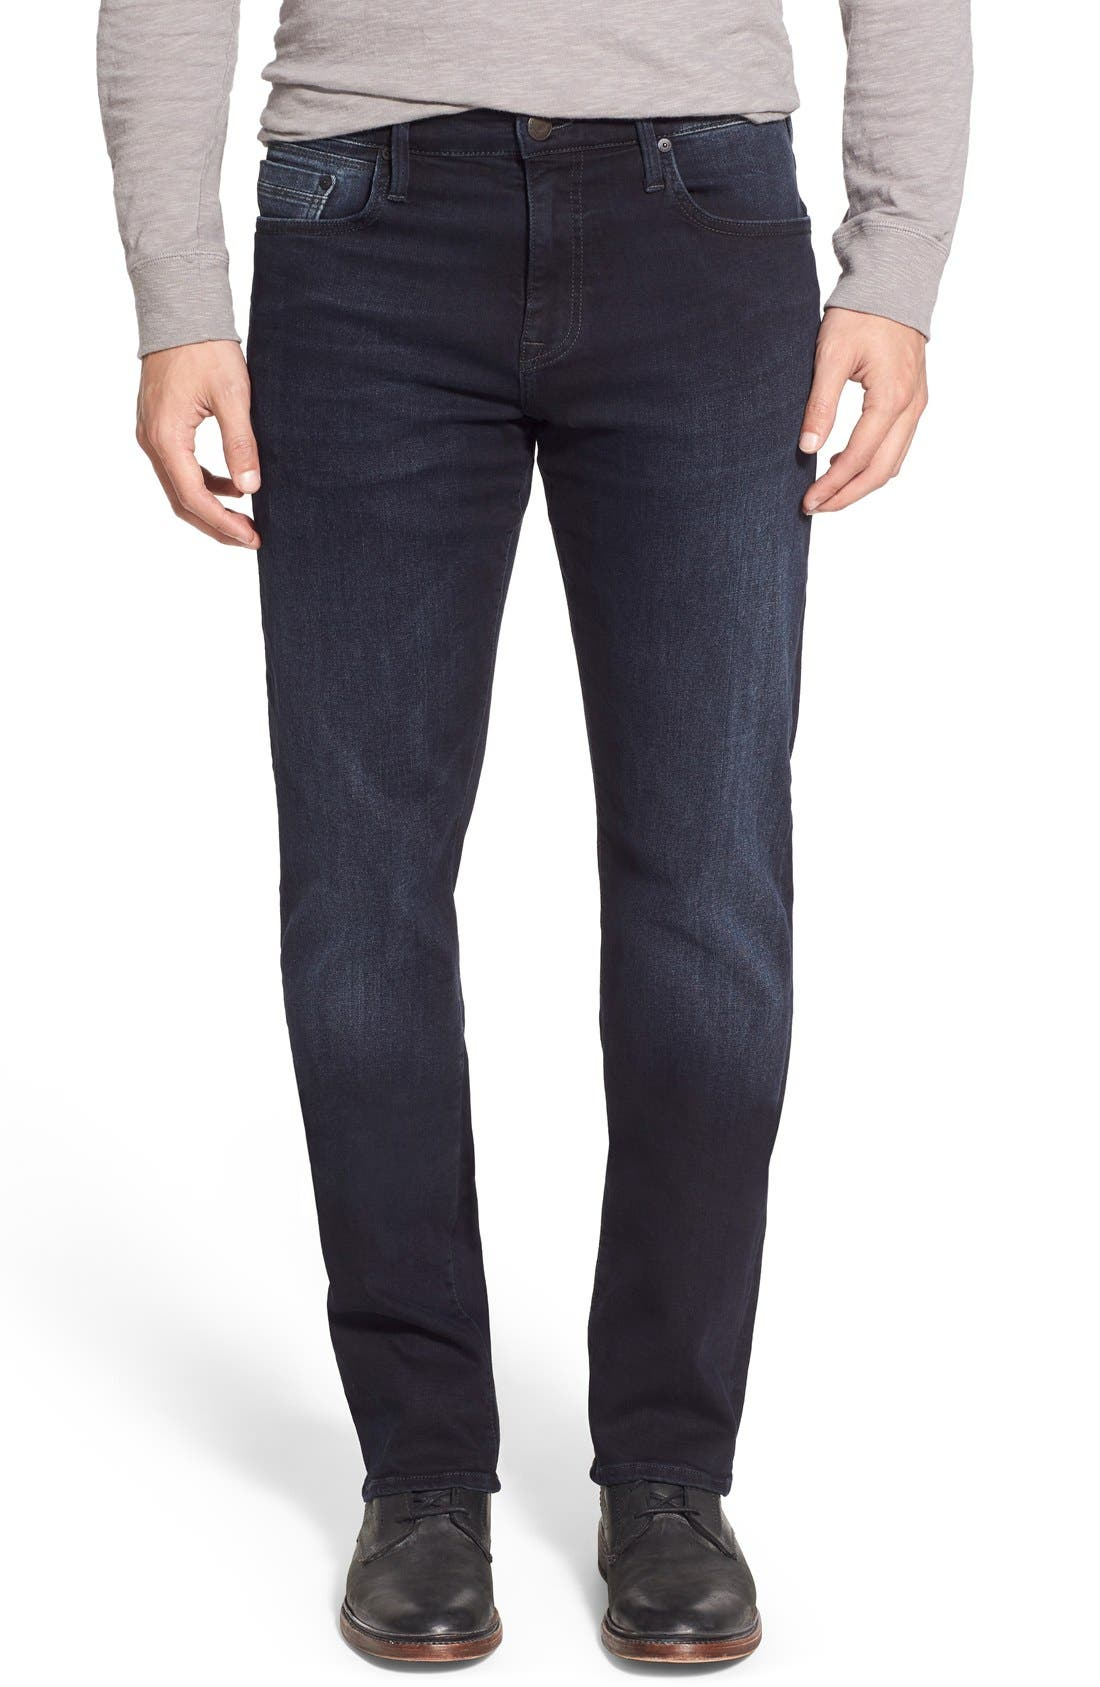 MAVI JEANS Matt Relaxed Fit Jeans, Main, color, INK WILLIAMSBURG